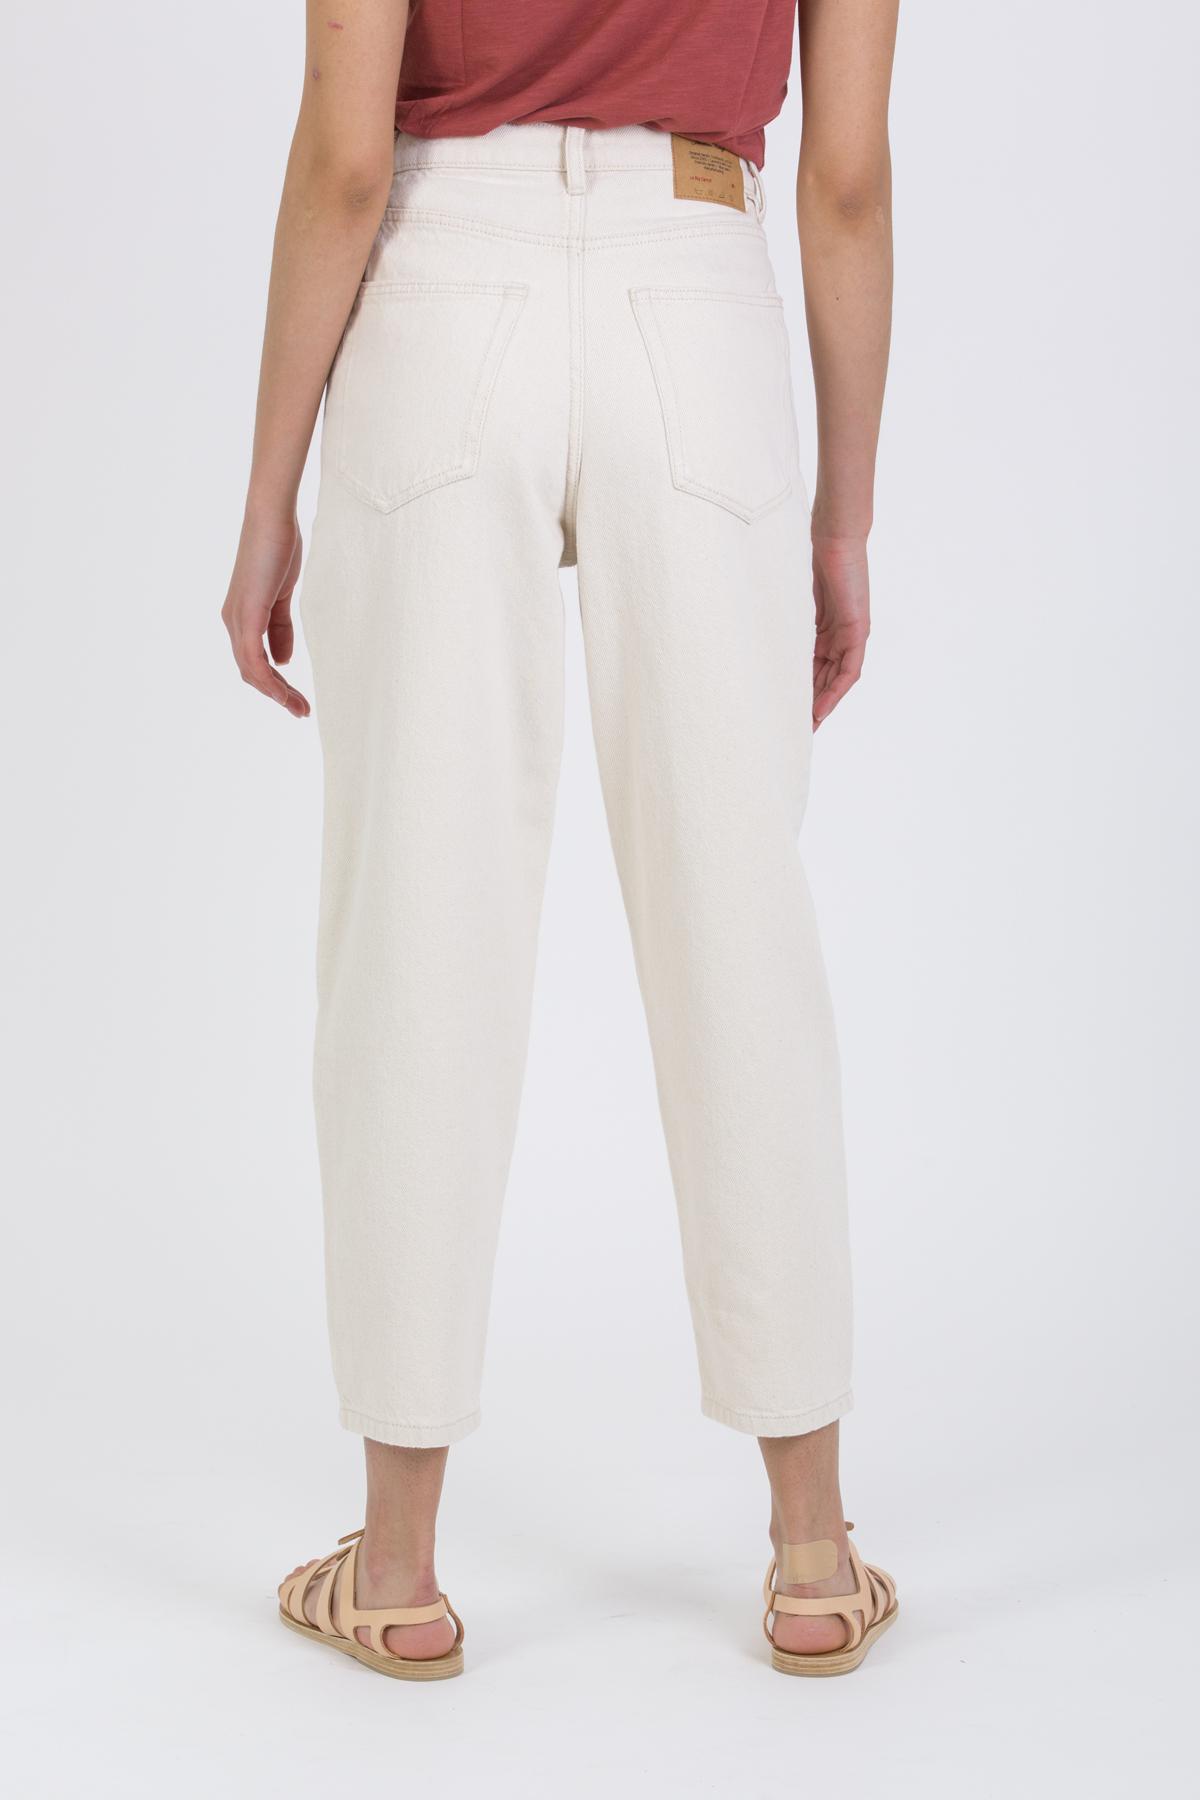 tine-borow-TINE11AE21-jeans-ecru-american-vintage-matchboxathens